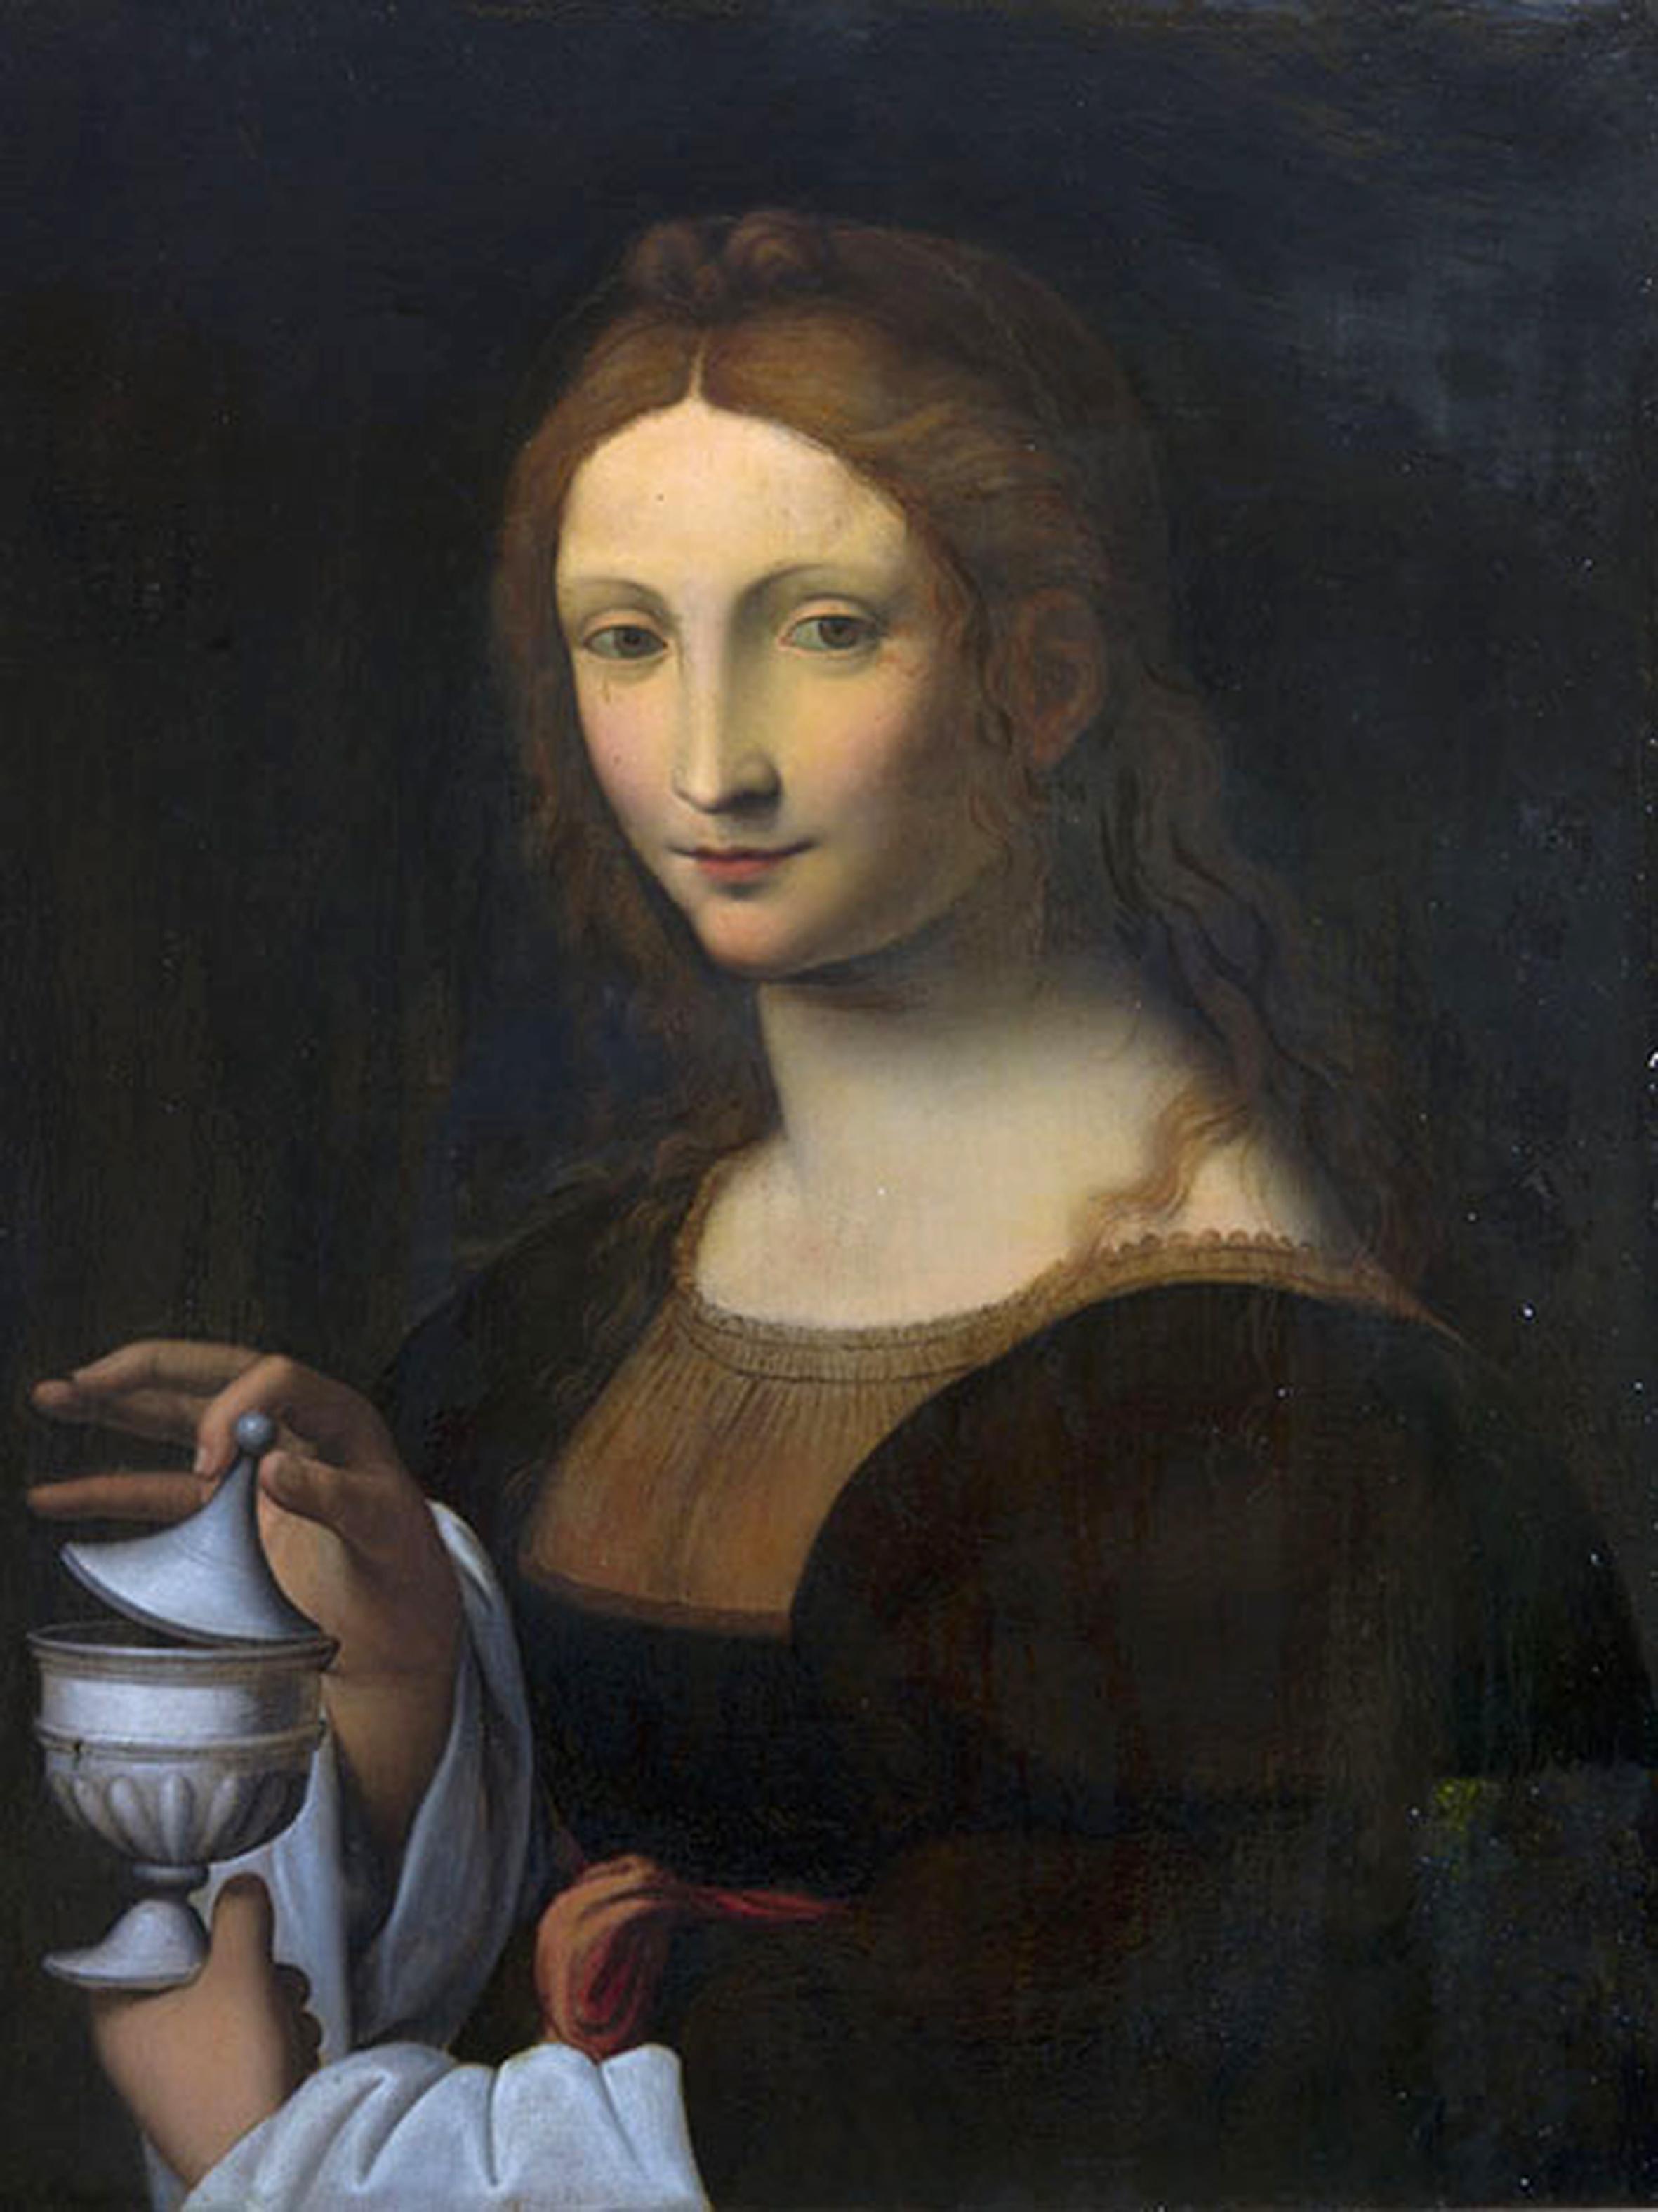 1. Painting attributed to Leonardo da Vinci, Salvator Mundi — 450.3 million 1. Painting attributed to Leonardo da Vinci, Salvator Mundi — 450.3 million new foto